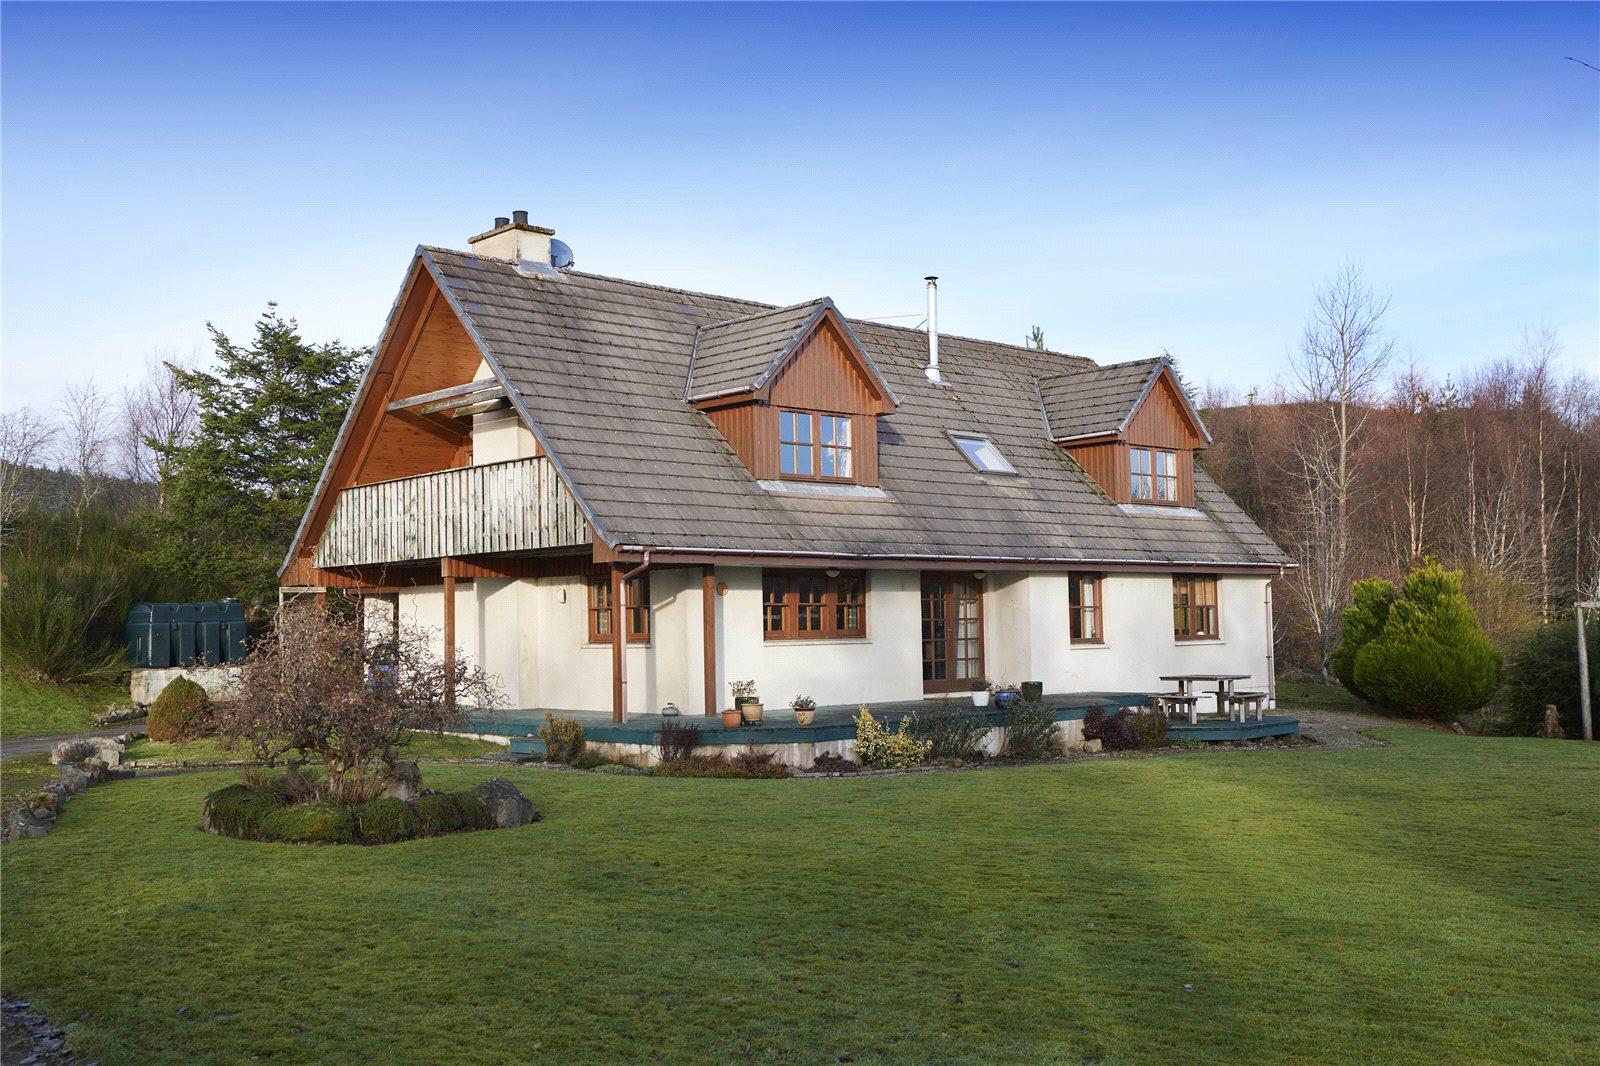 4 Bedrooms Detached House for sale in Kinloch, Kinellan, Strathpeffer, IV14